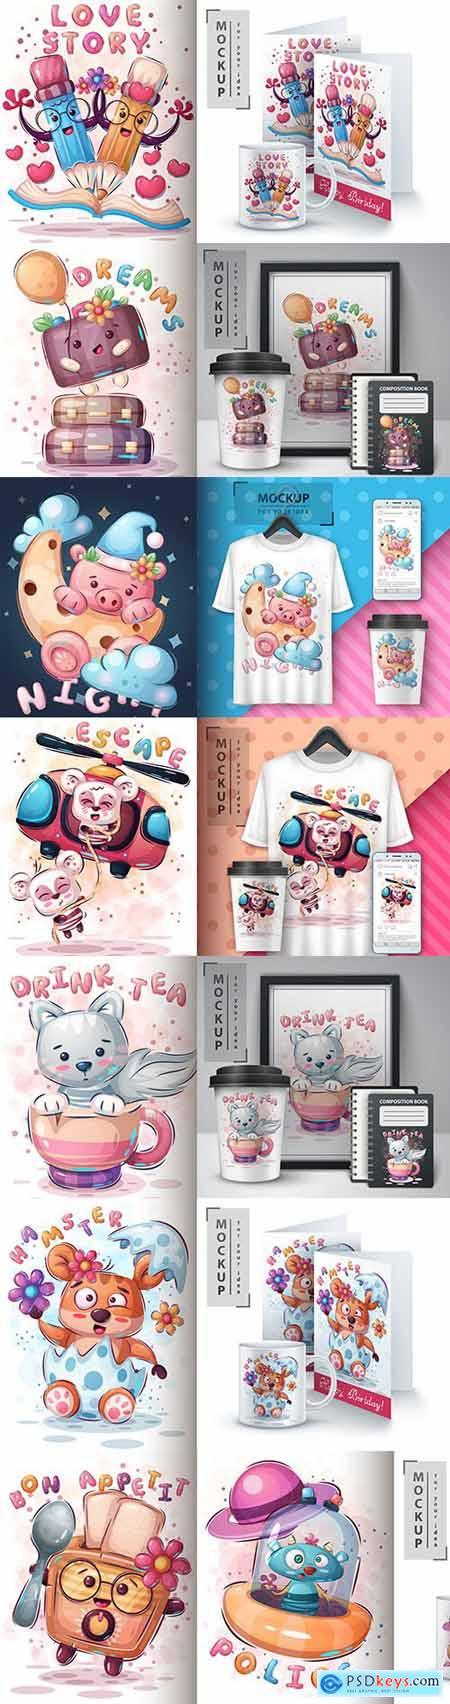 Funny illustration and merchandising mockup print t-shirt 14